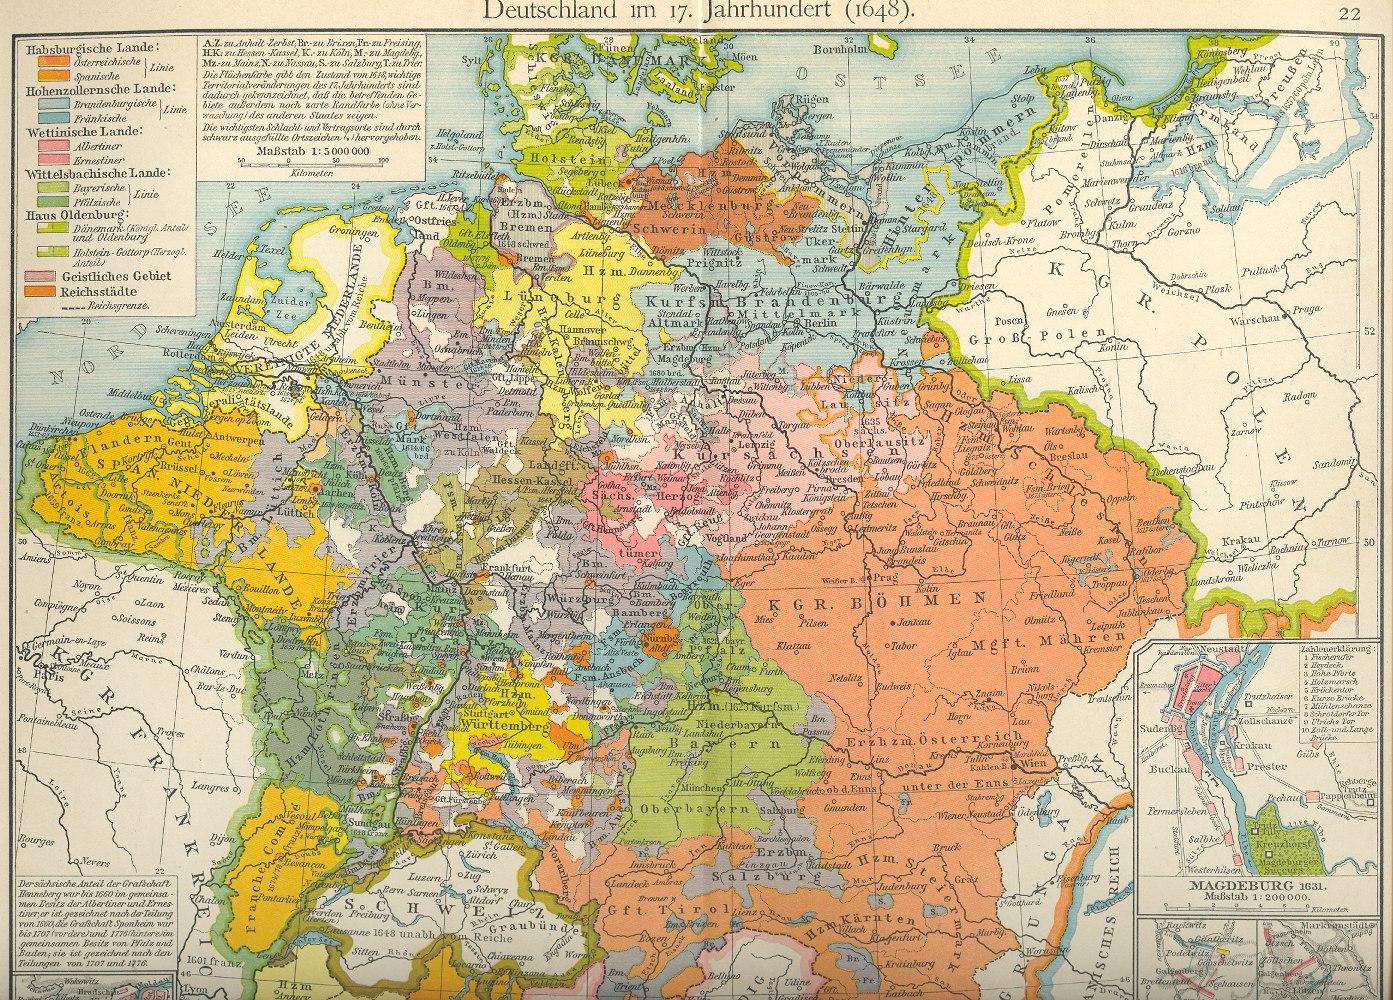 Deutsche Karte Vor Dem 1 Weltkrieg.Historische Landkarten